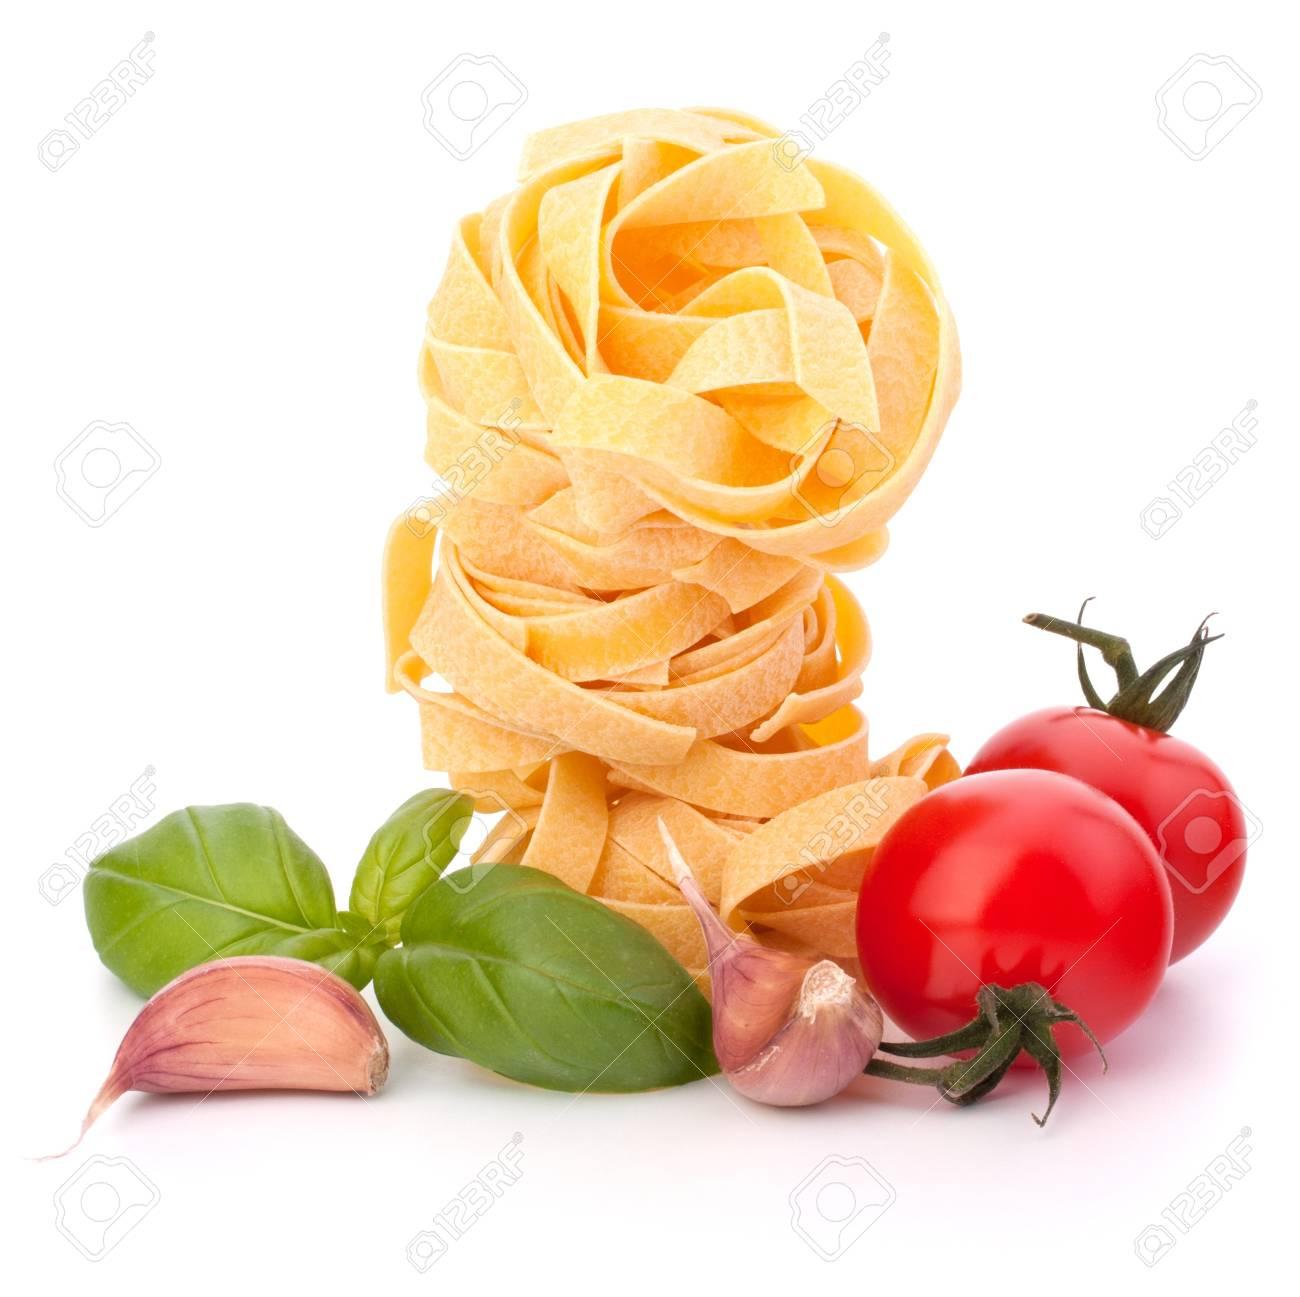 Italian pasta fettuccine nest  and cherry tomato isolated on white background Stock Photo - 11447165